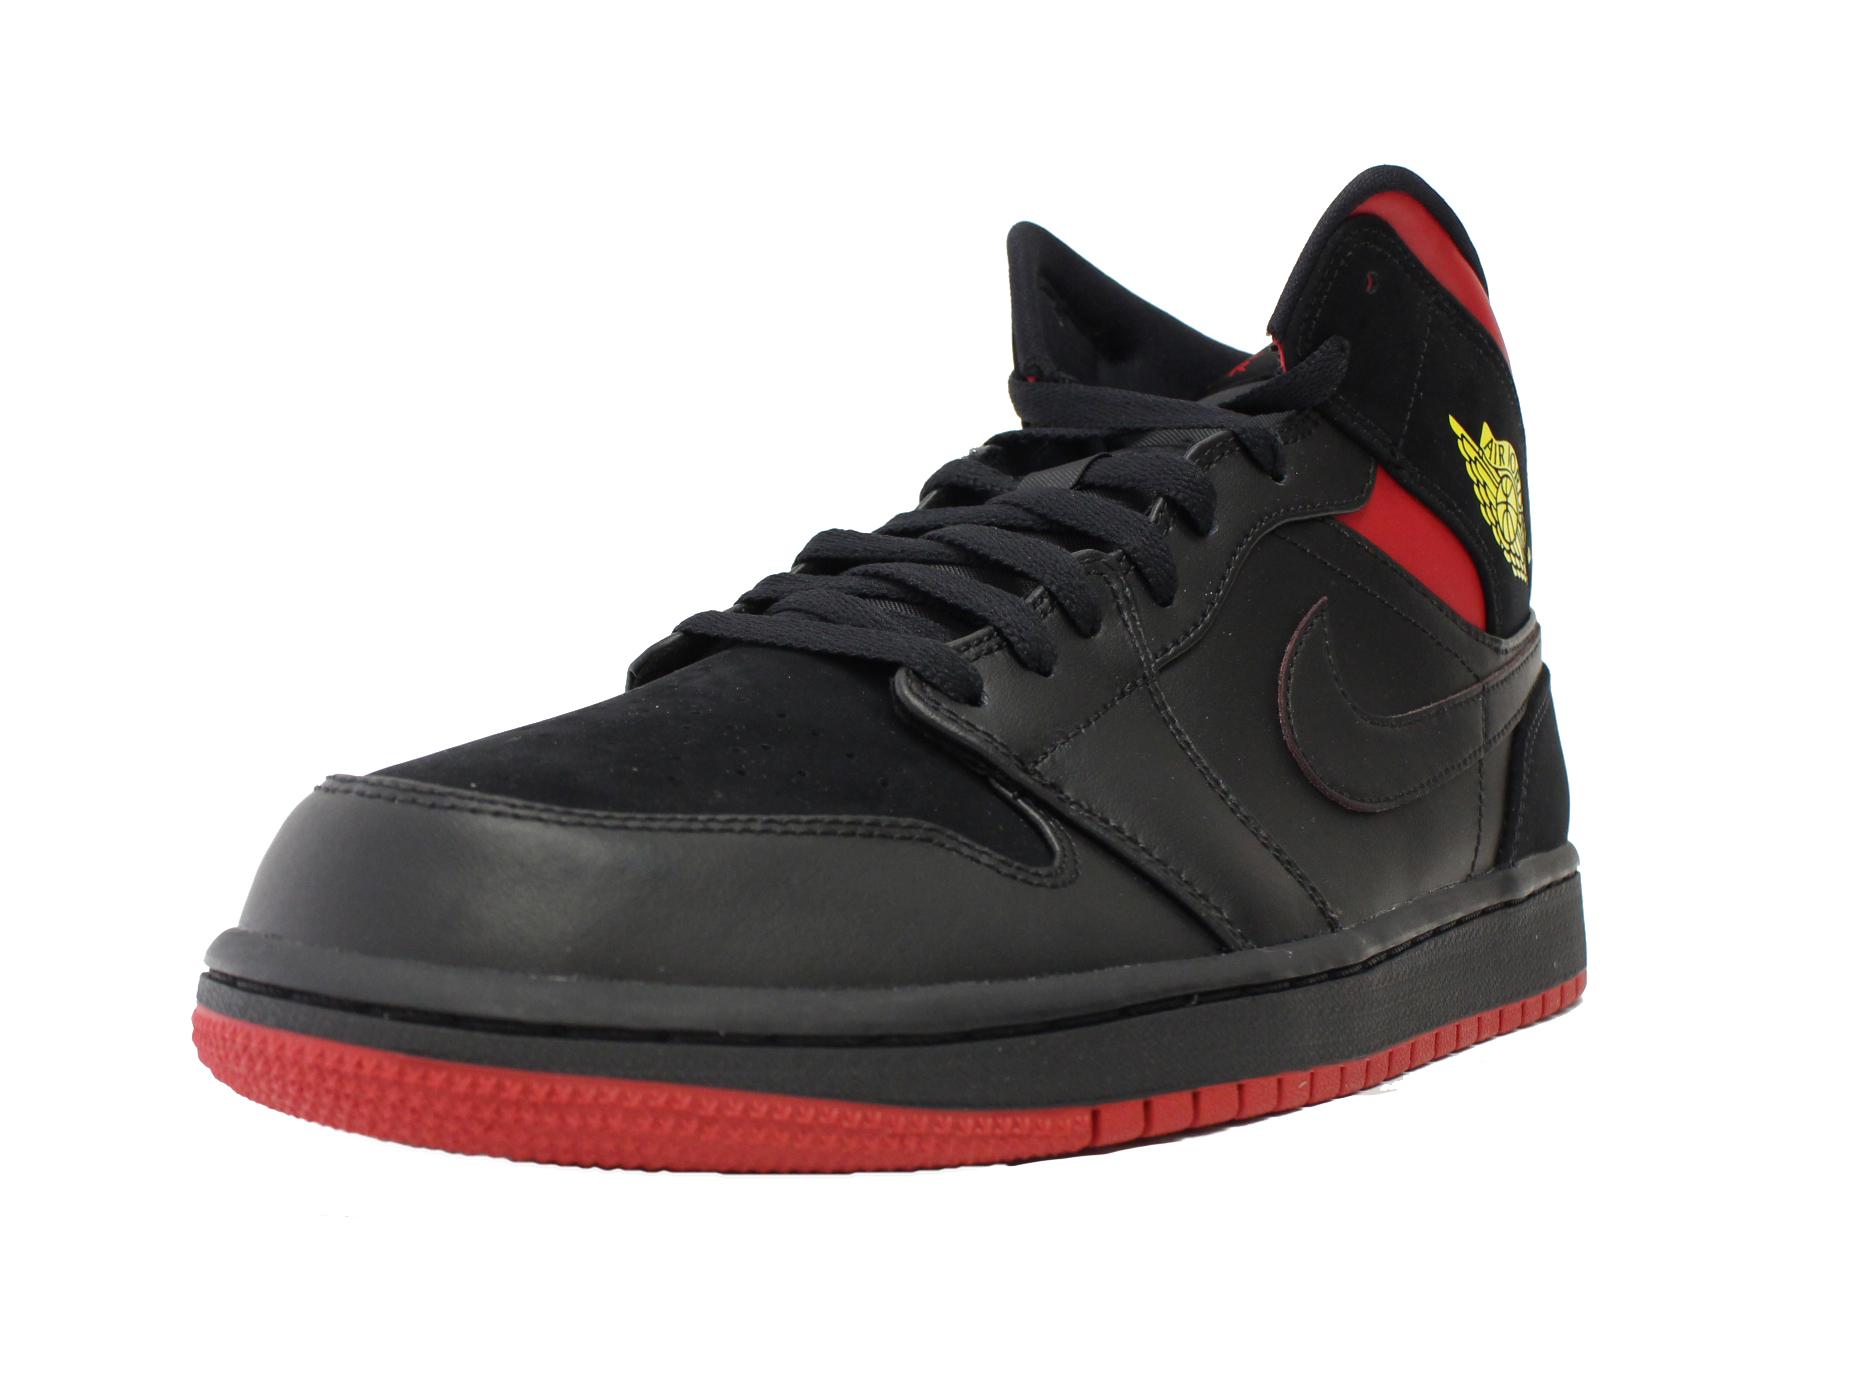 new product 358ec f4a1c NIKE AIR JORDAN 1 MID LAST SHOT BLACK RED YELLOW BRED 554724 076 ...